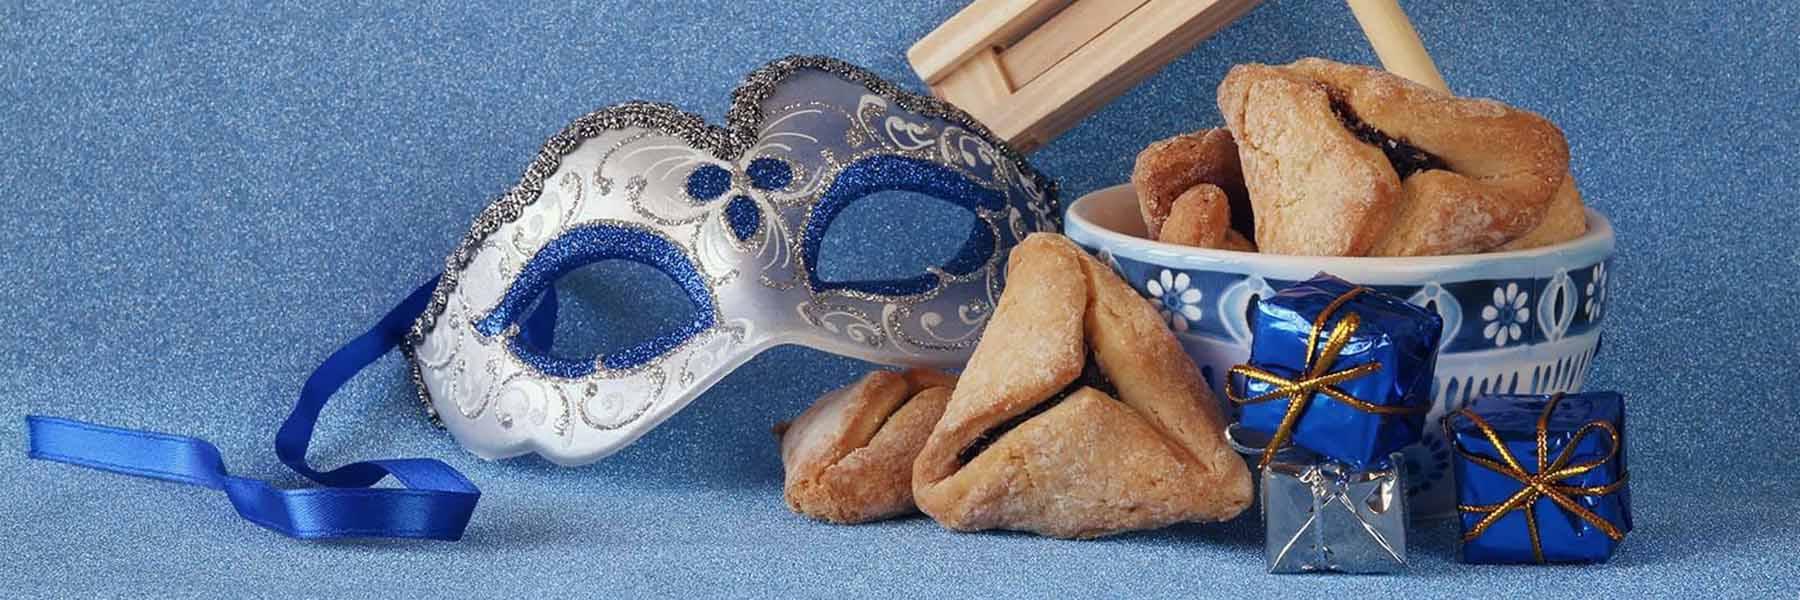 Purim Gift Baskets